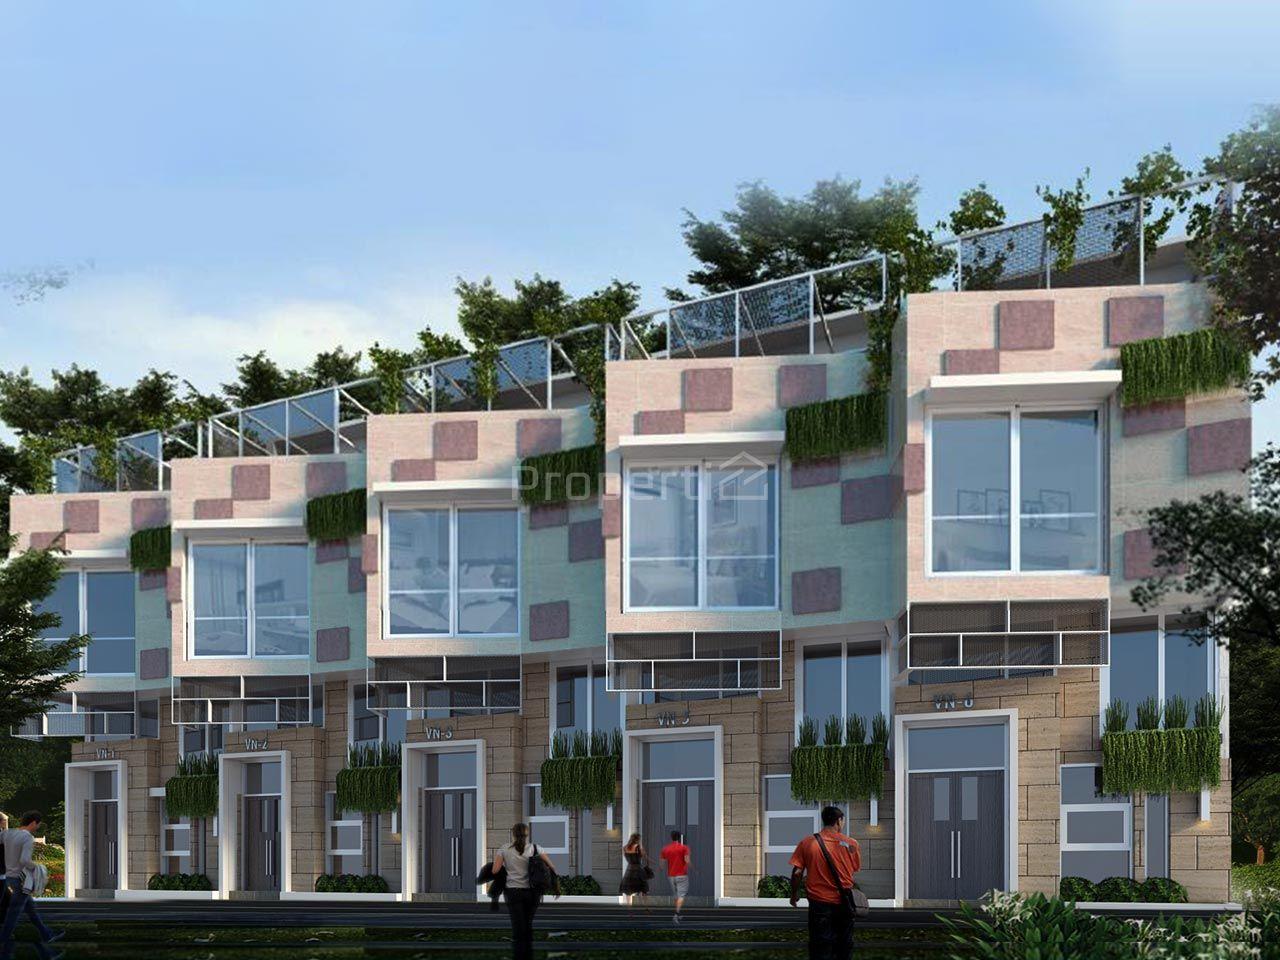 Rumah Cluster Serasa Apartemen di Lebak Bulus, DKI Jakarta